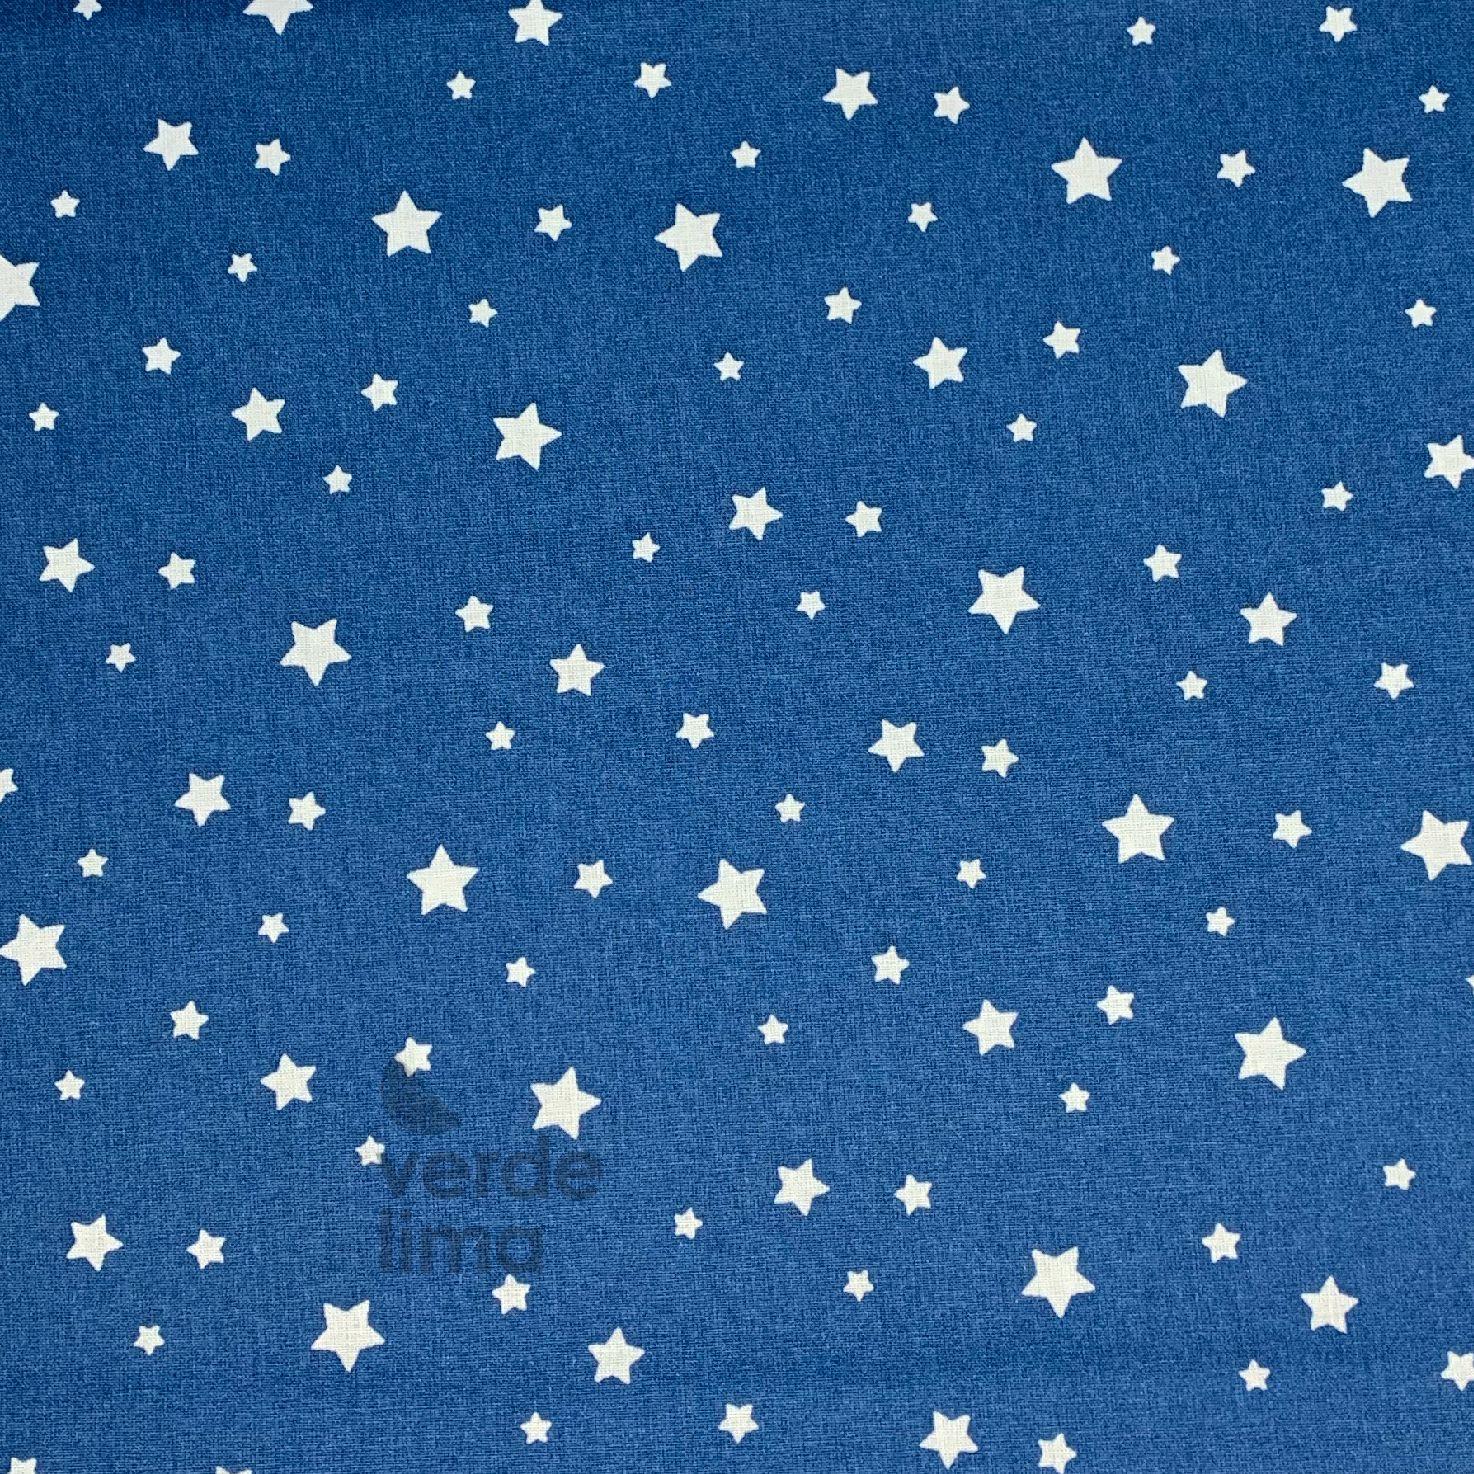 Estrelas fundo azul Indigo